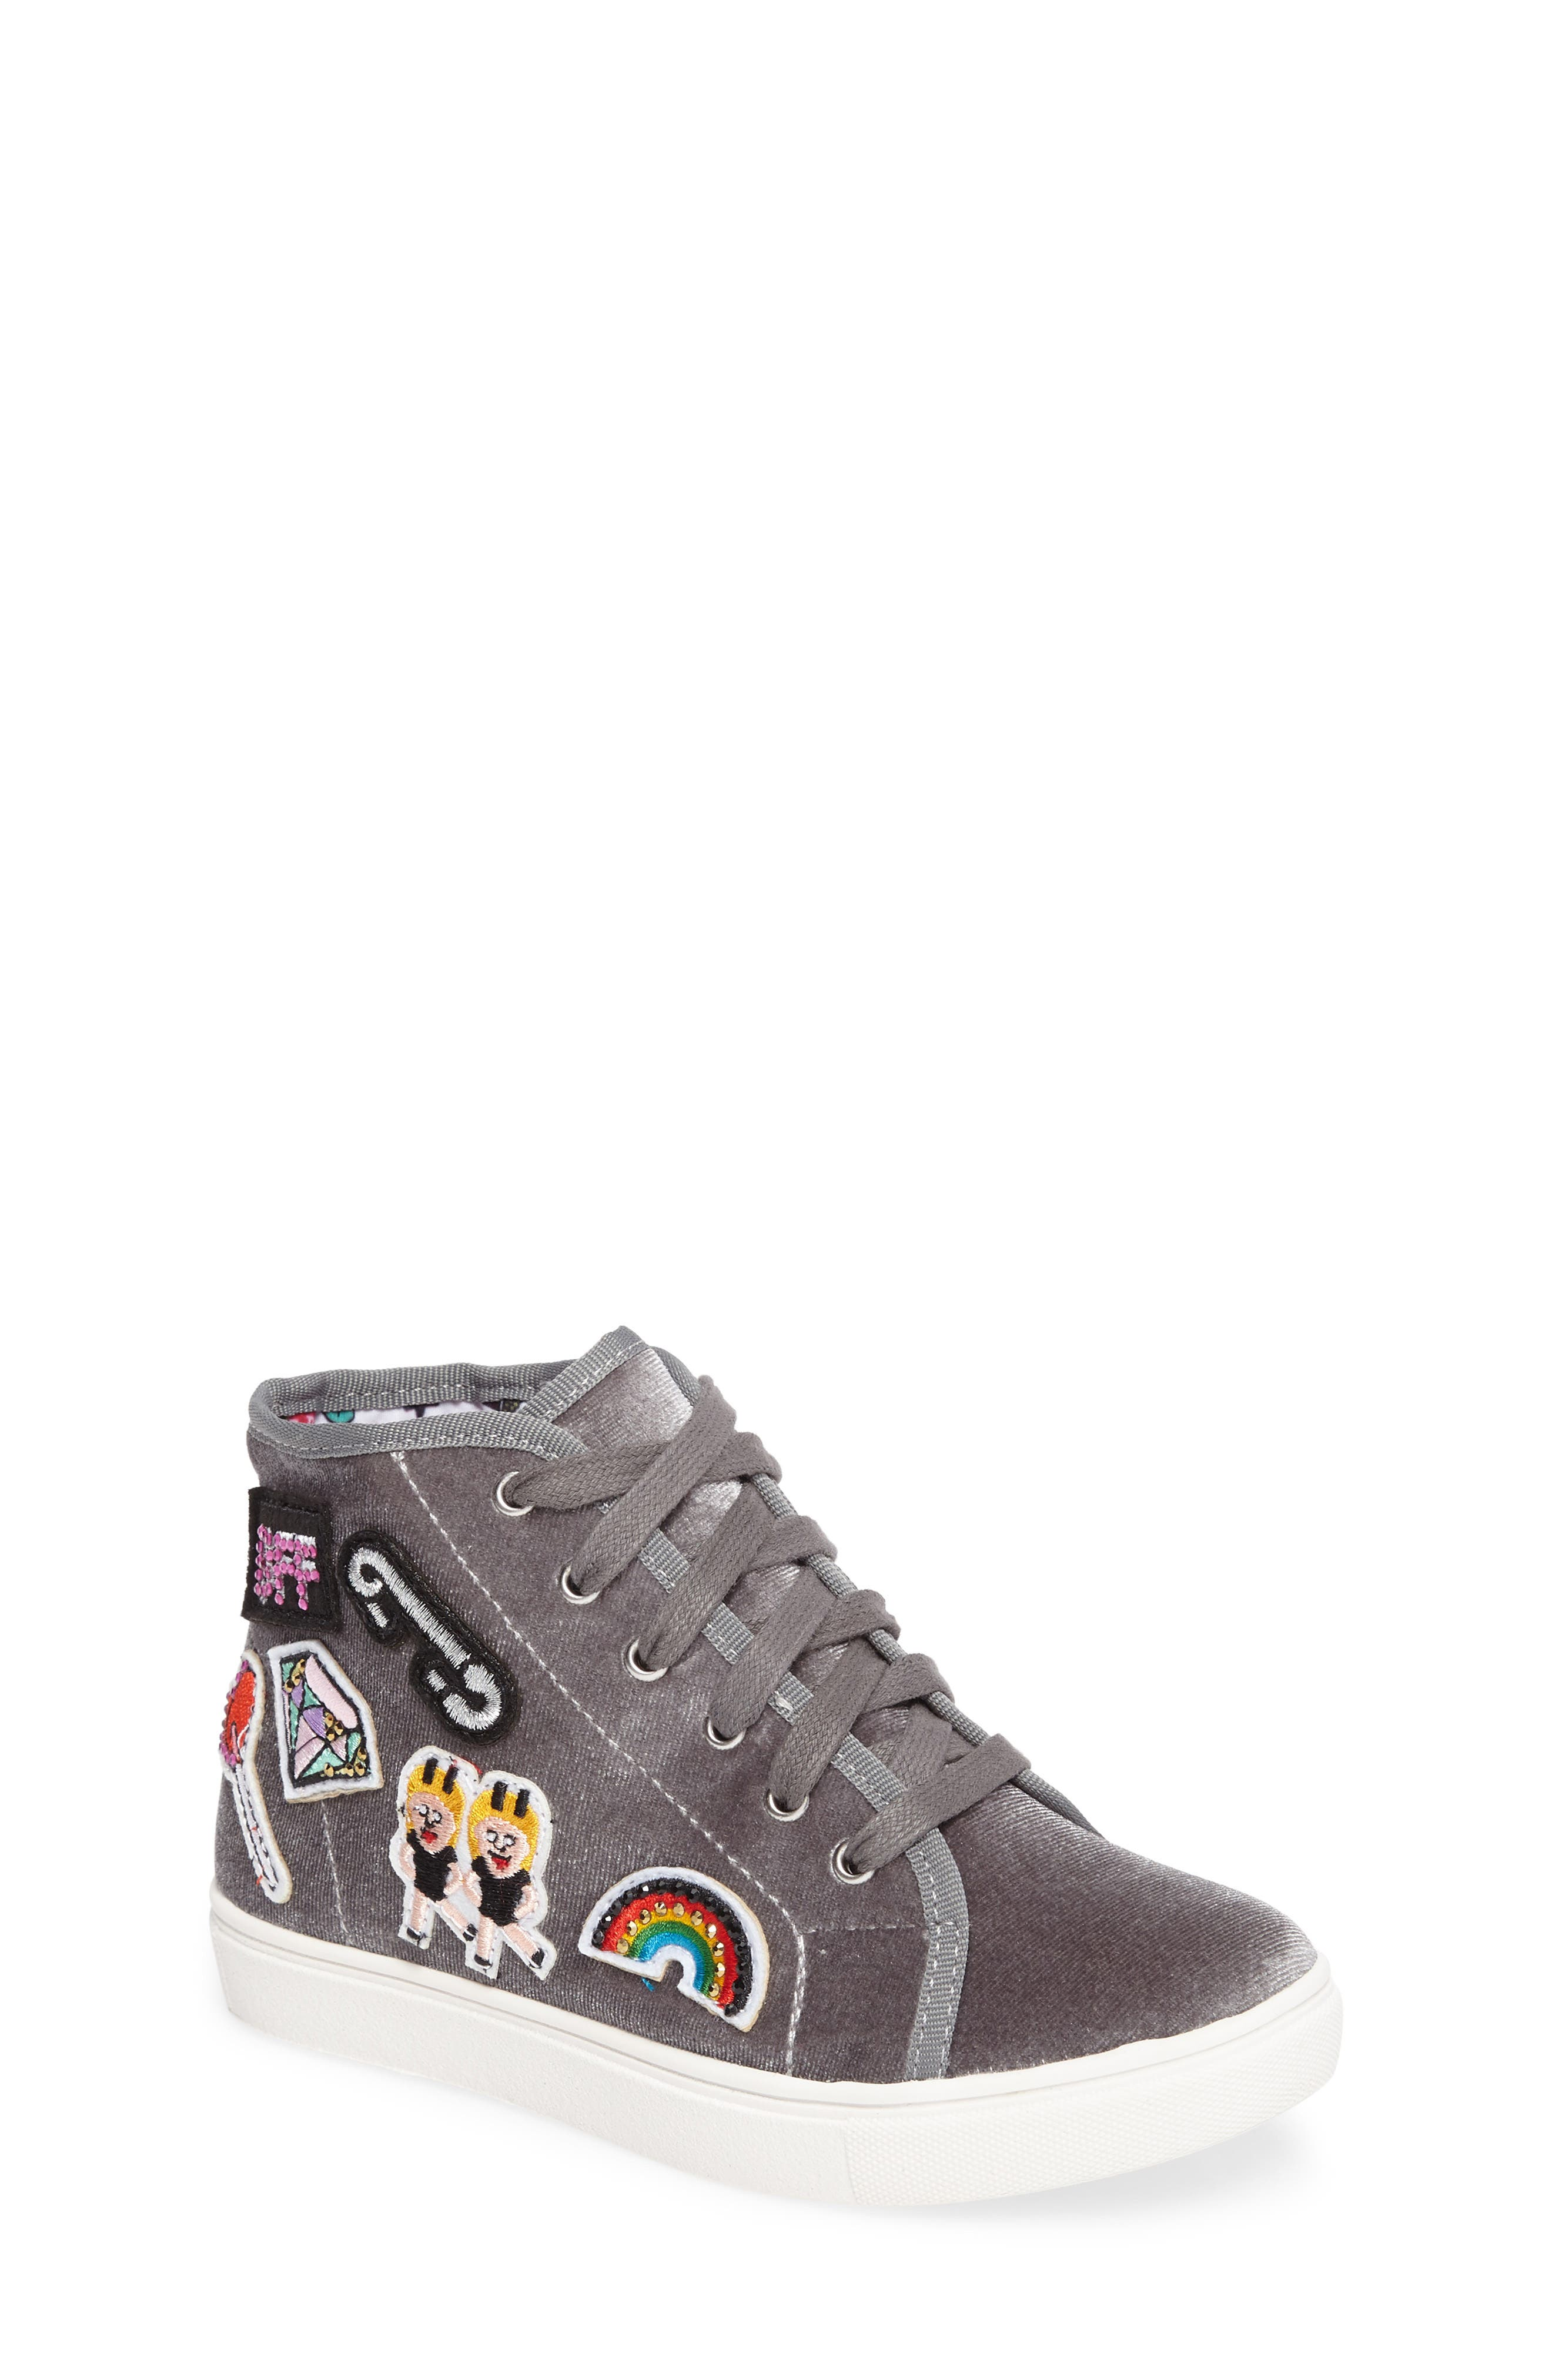 J-BFF High Top Sneaker,                         Main,                         color, 055